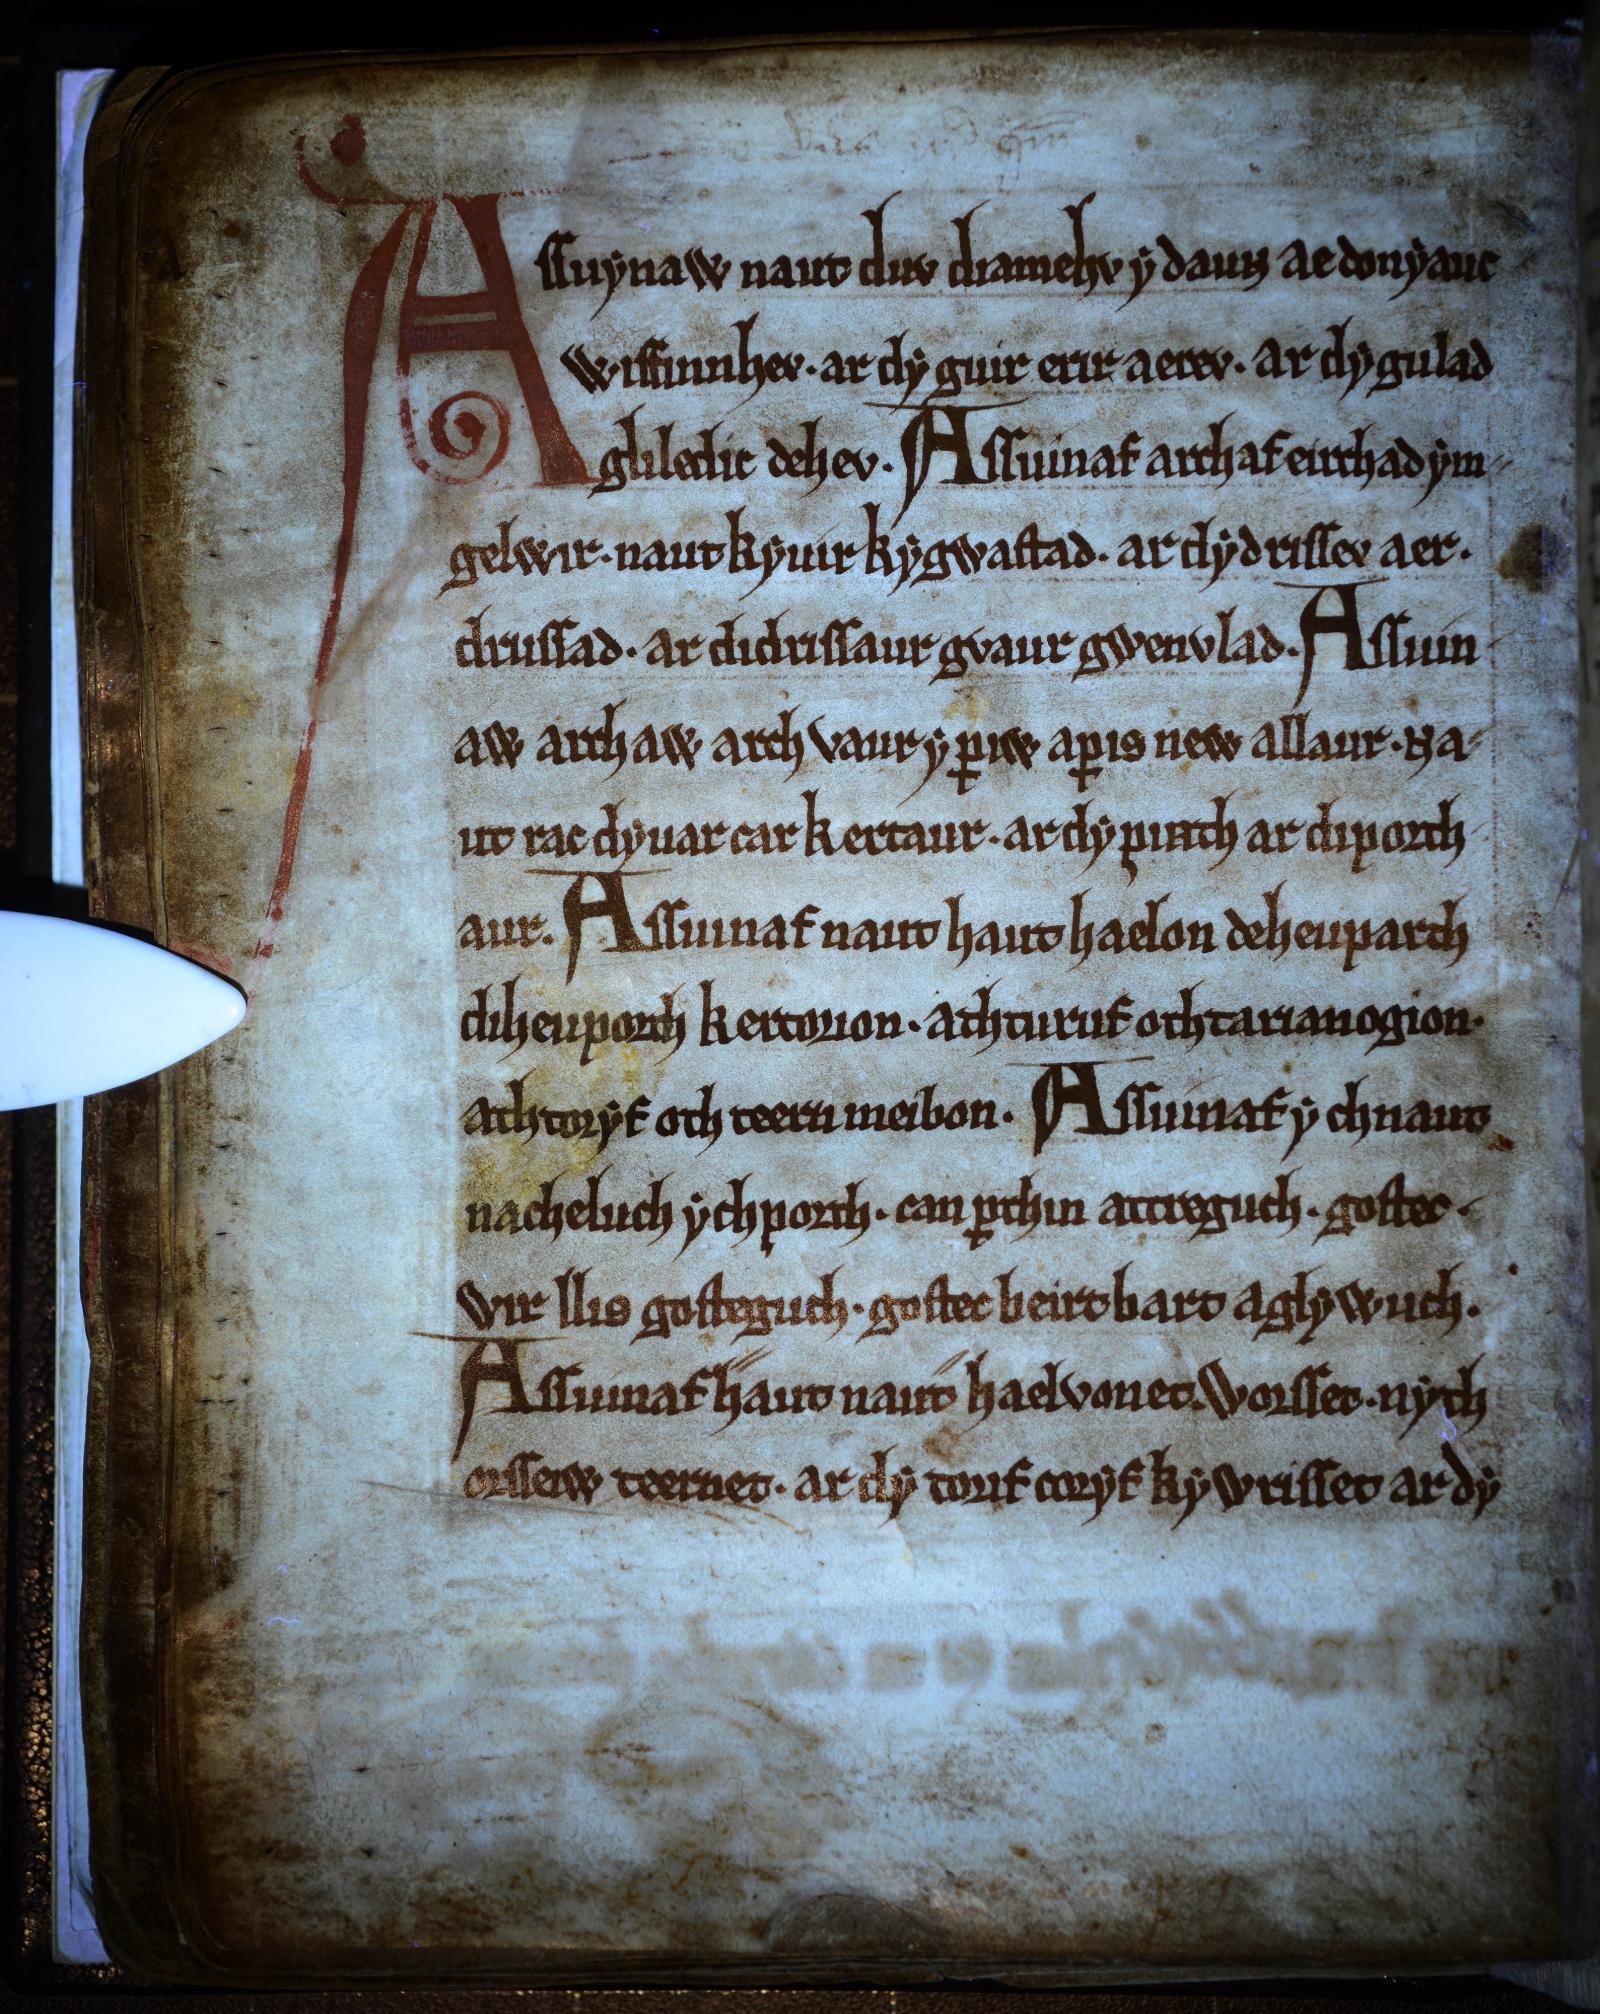 The Black Book of Carmarthen